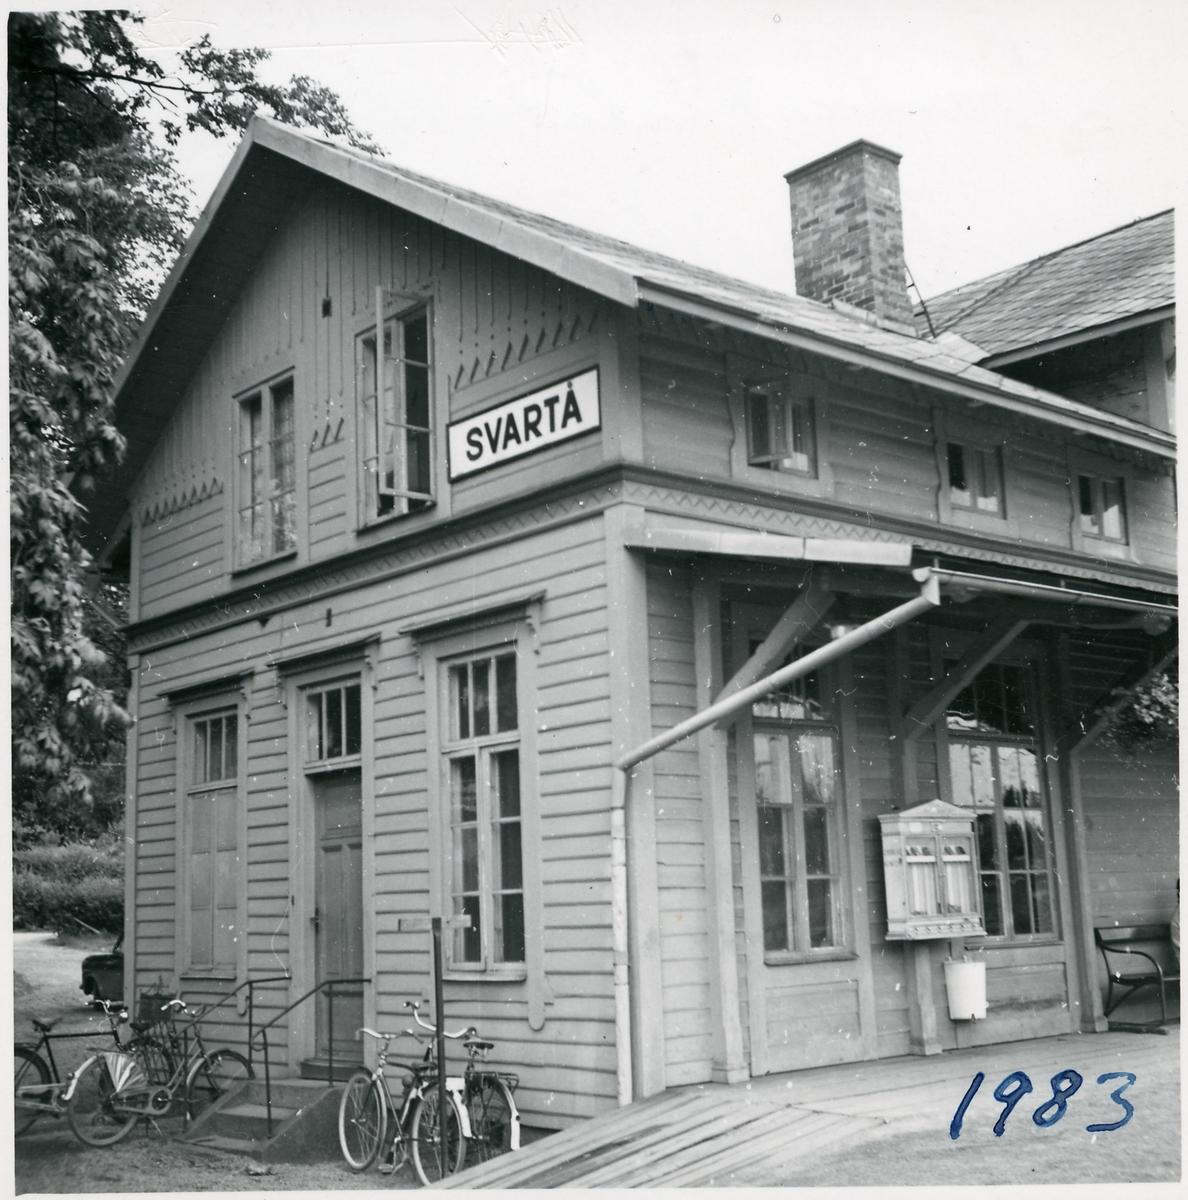 Svartå stationshus.